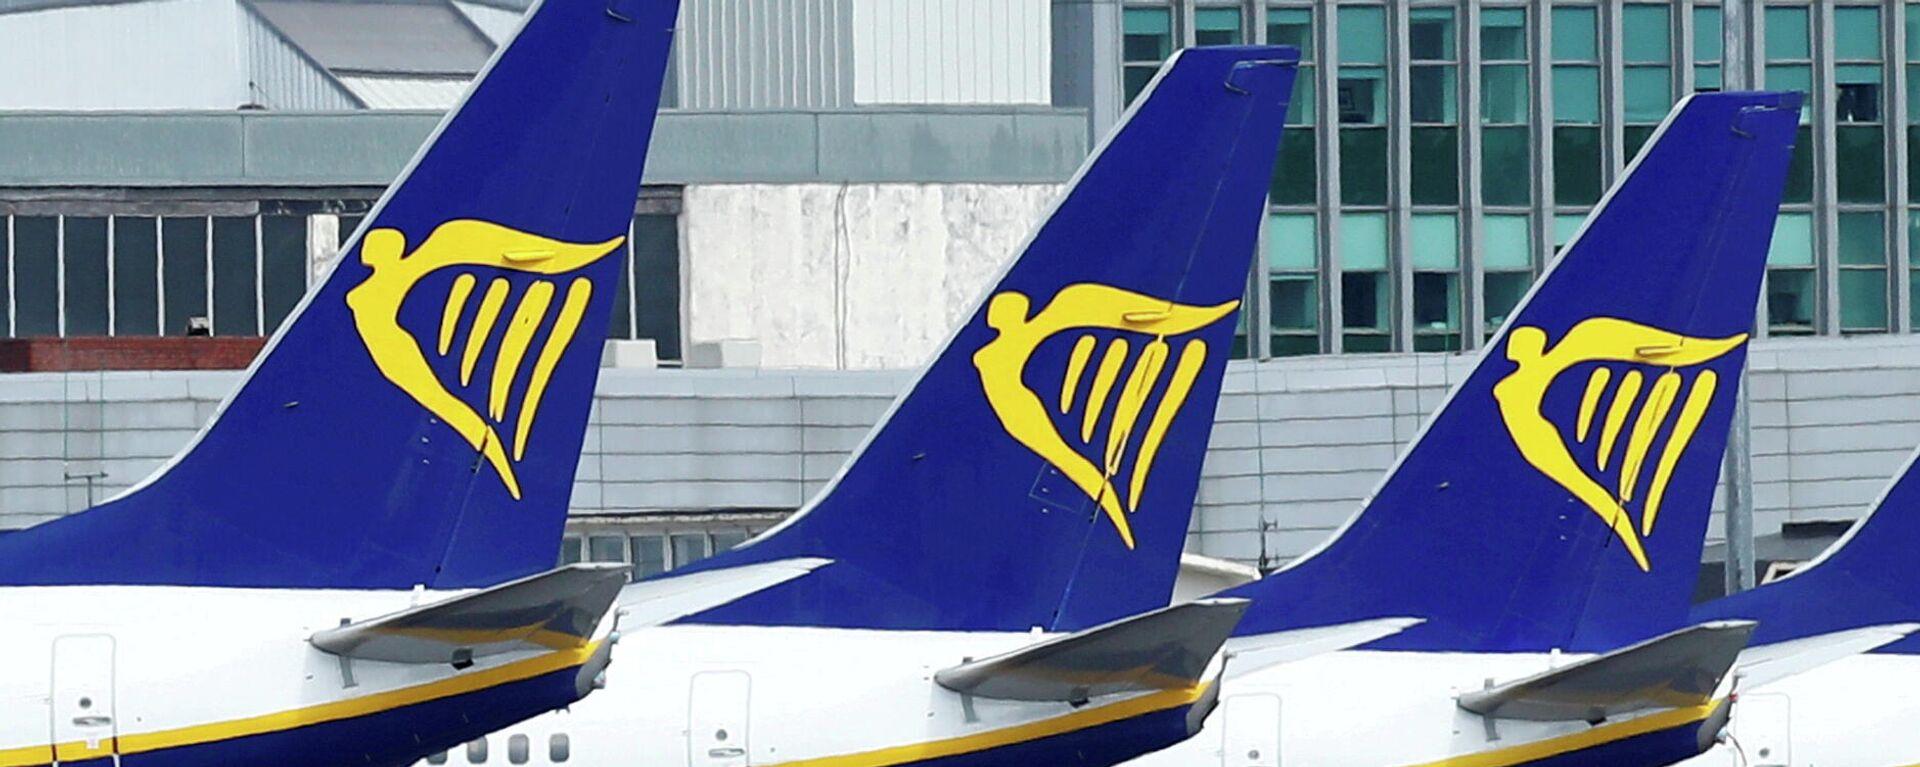 Ryanair, el aerolínea irlandesa  - Sputnik Mundo, 1920, 24.05.2021